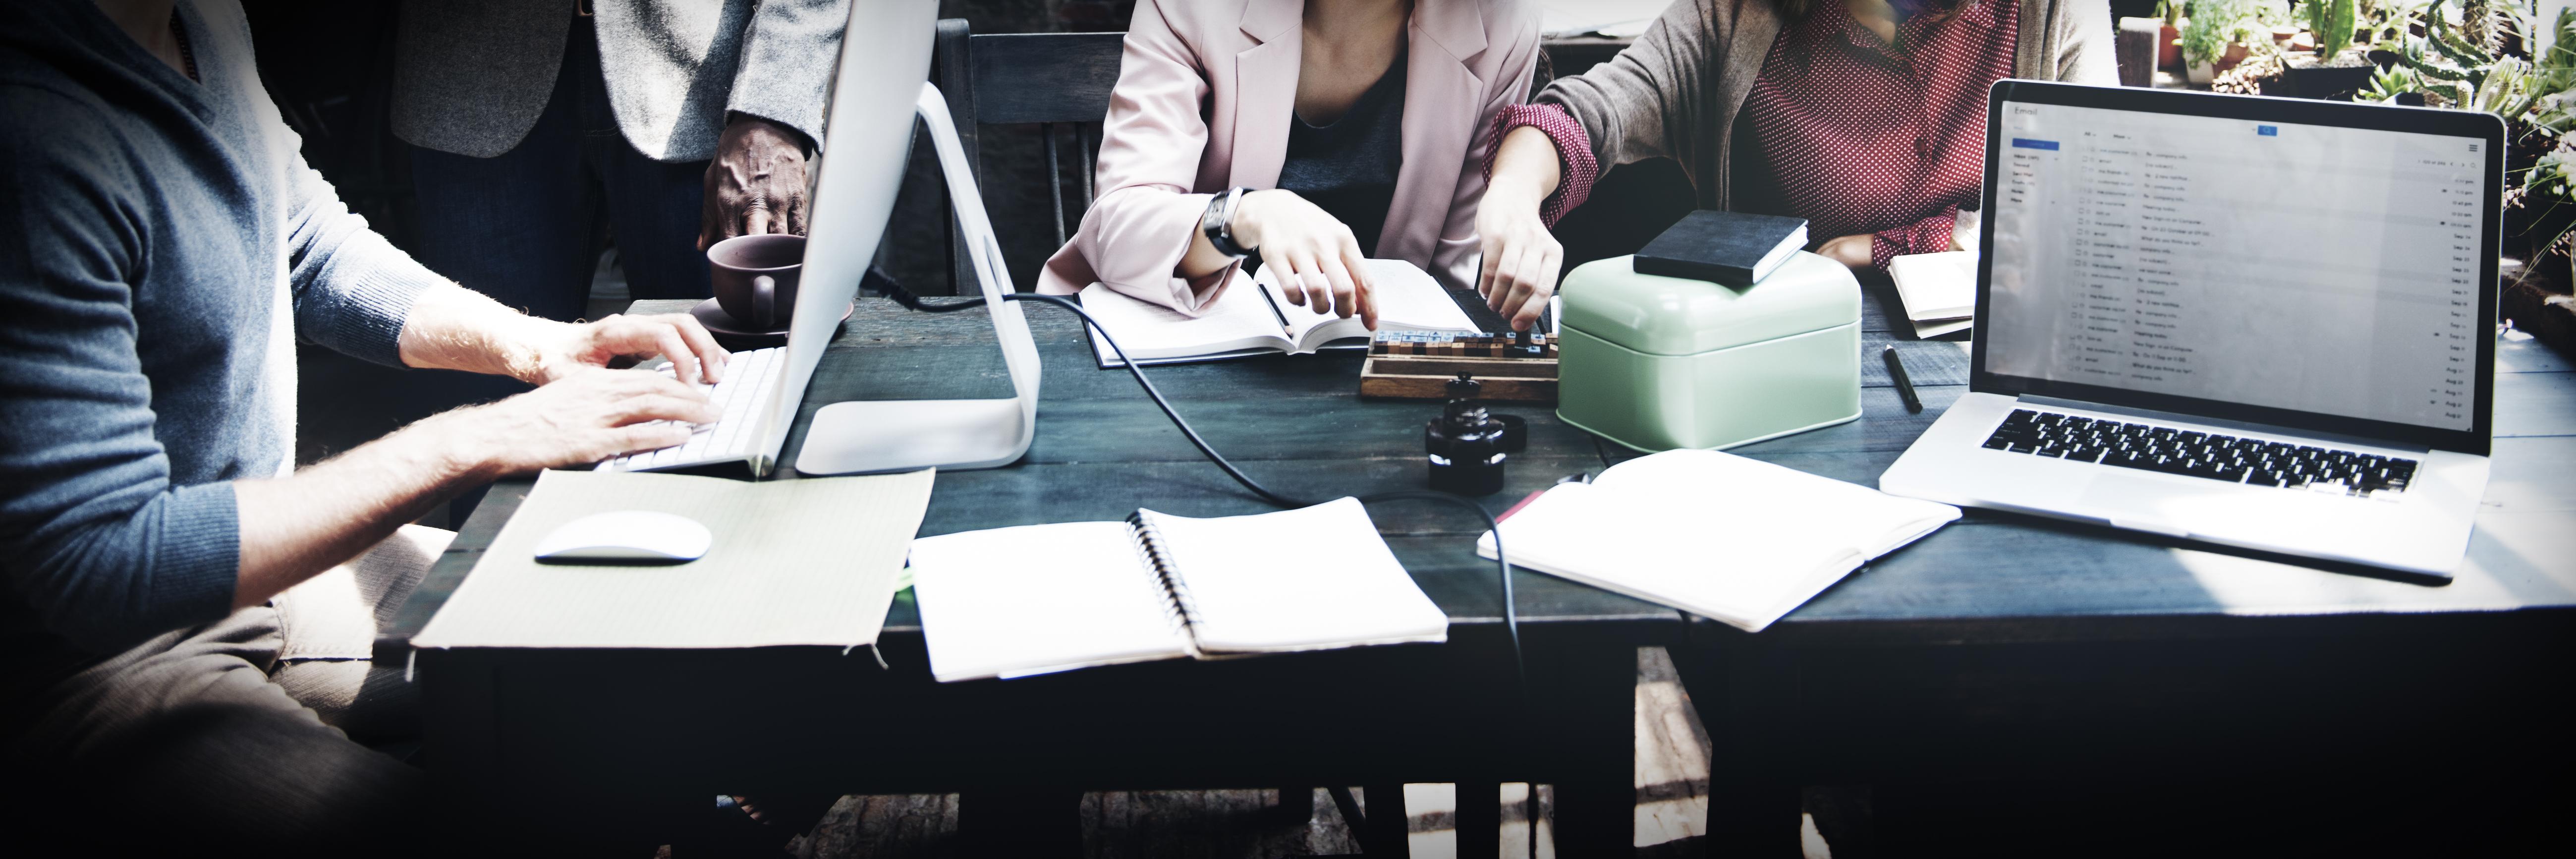 Dossier werk en inkomen